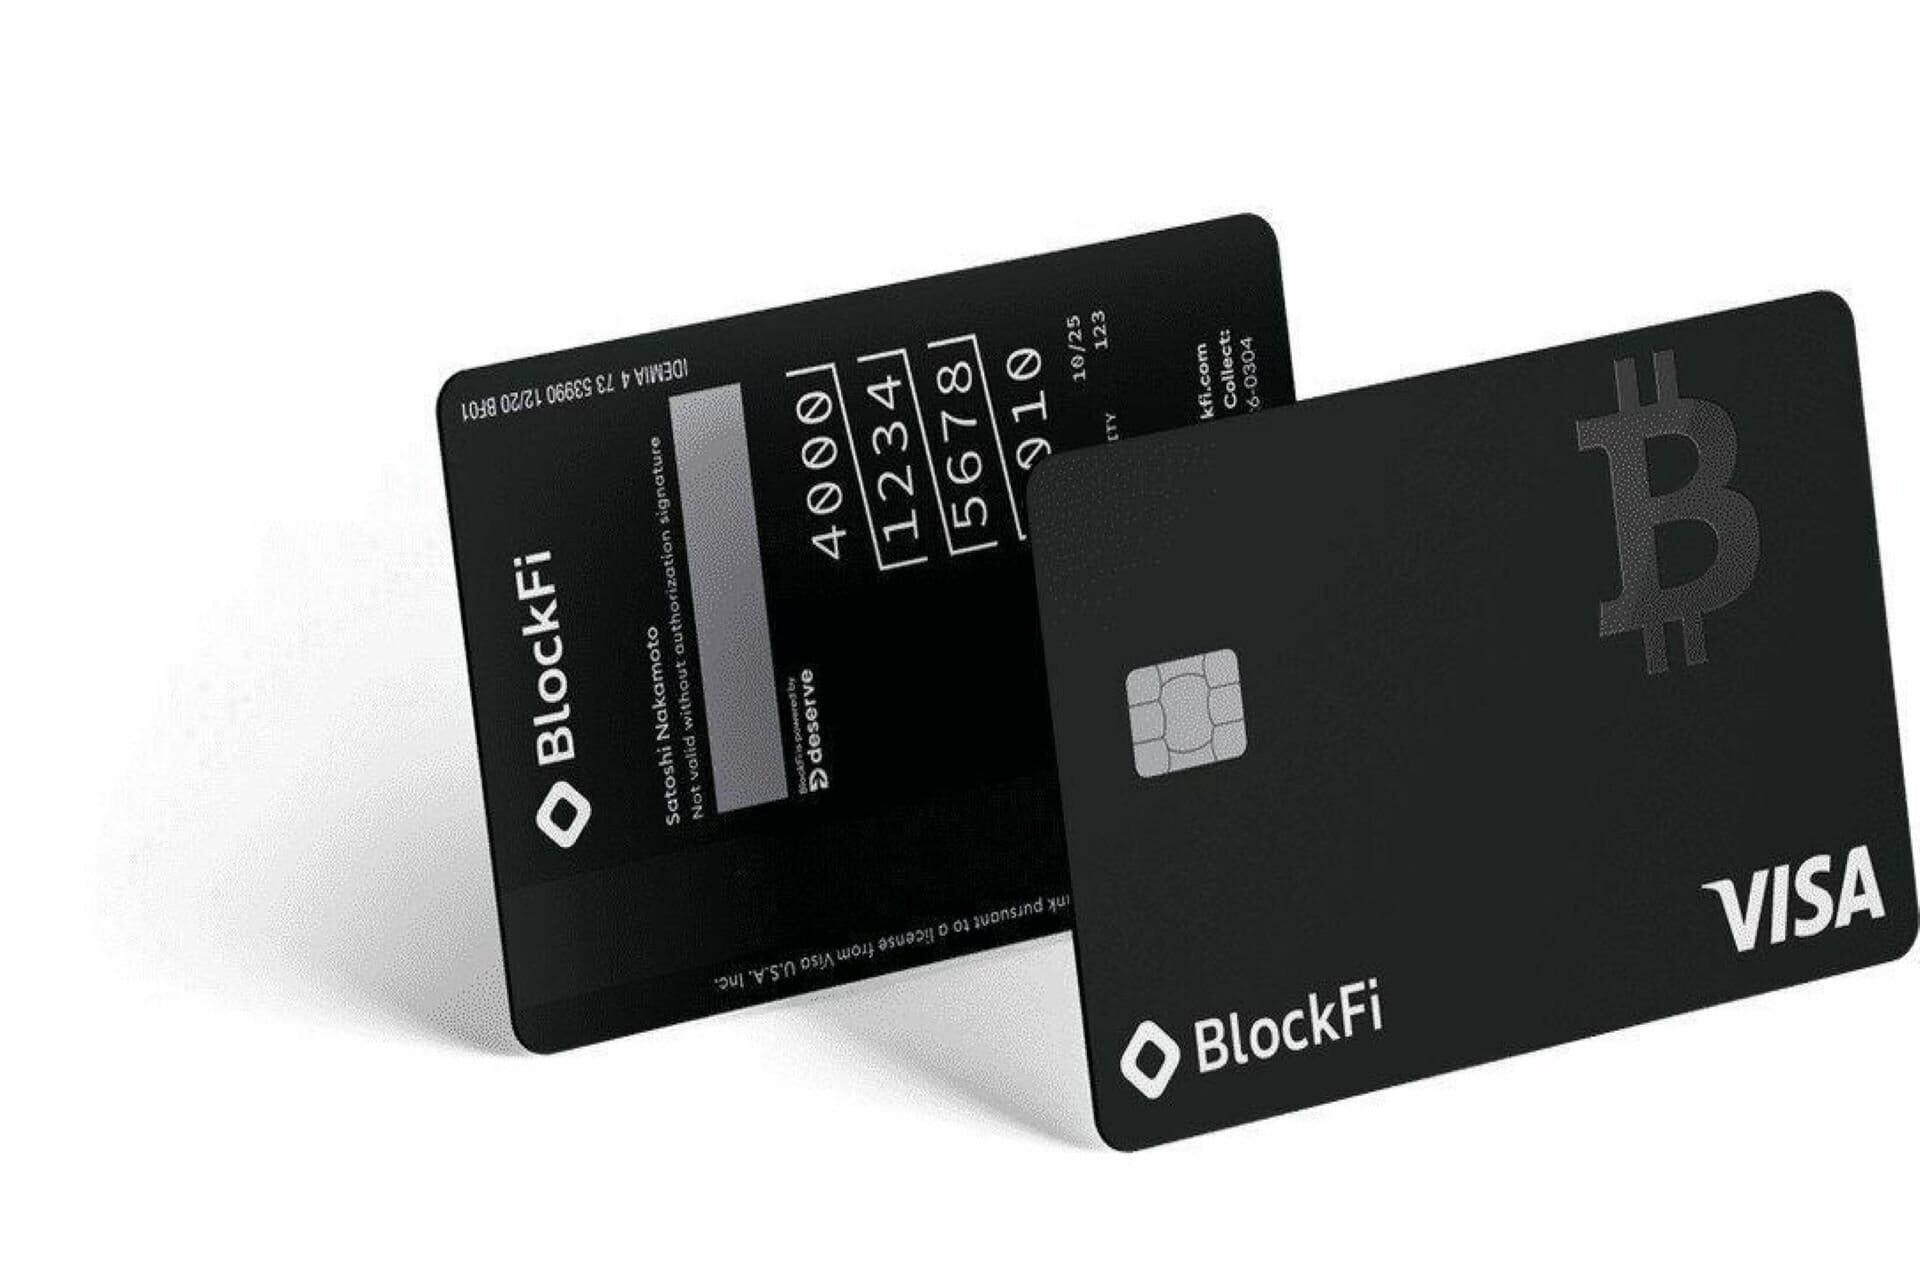 blockfi bitcoin credit card now live